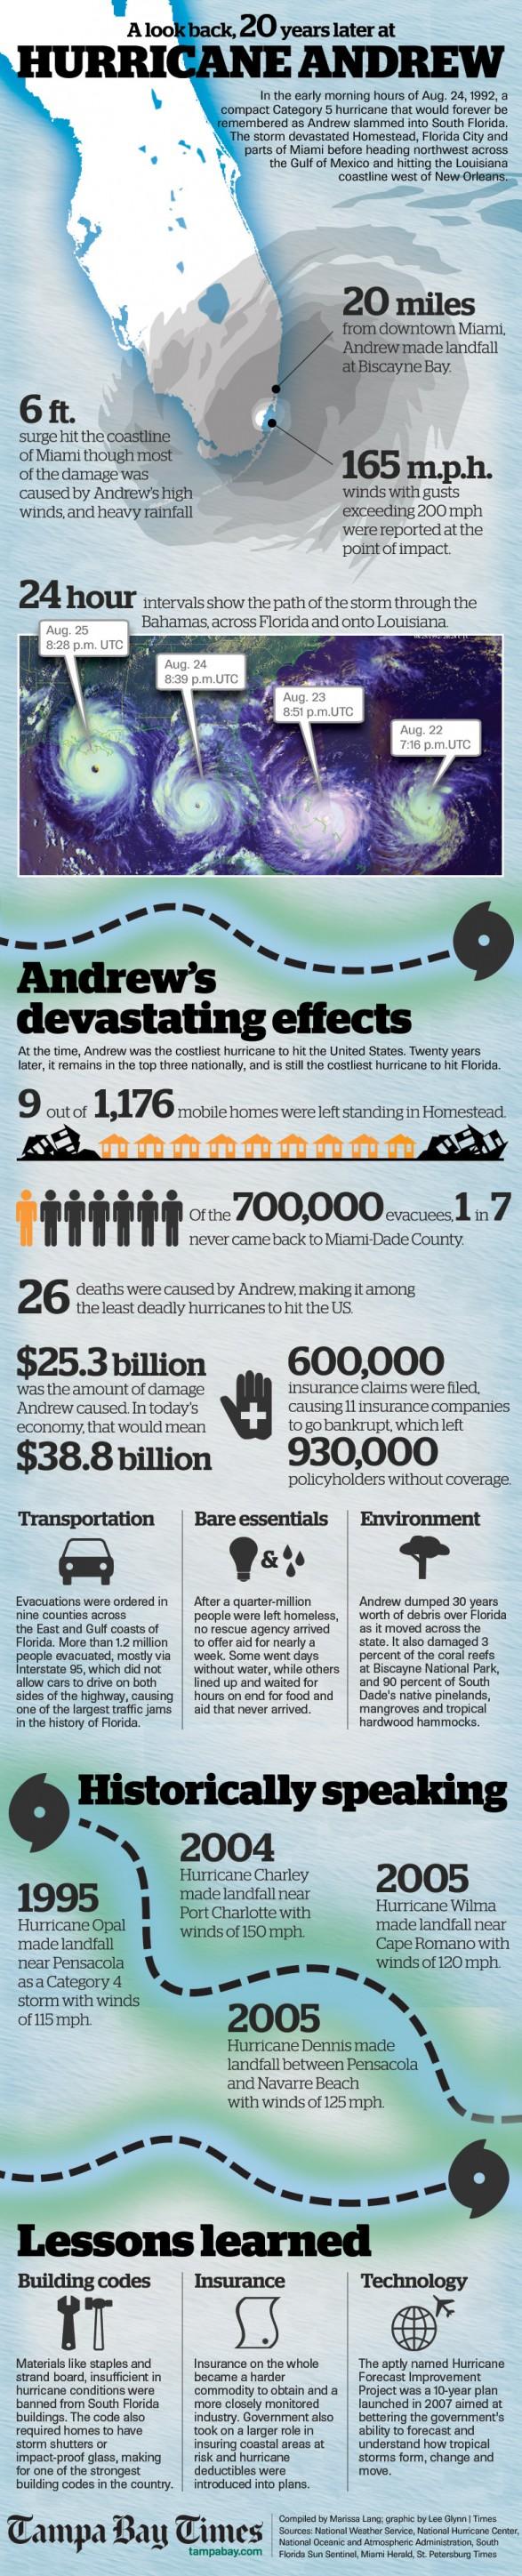 Hurricane-Andrew-Facts-infographic